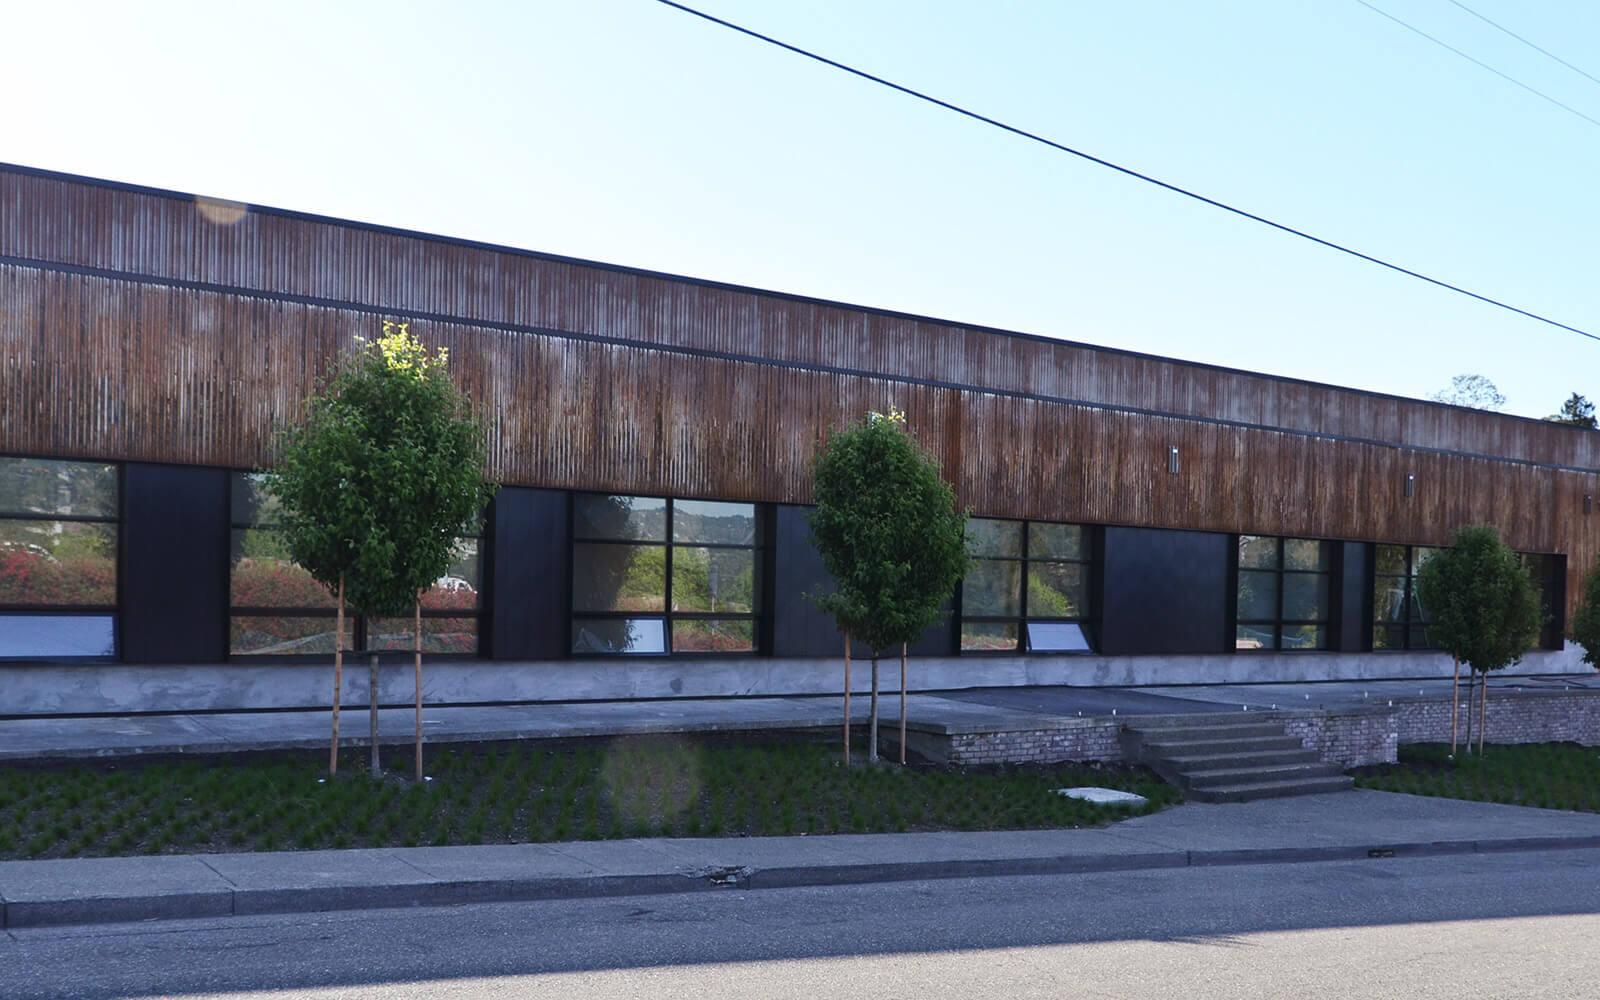 studio vara case study redwood highway rendering